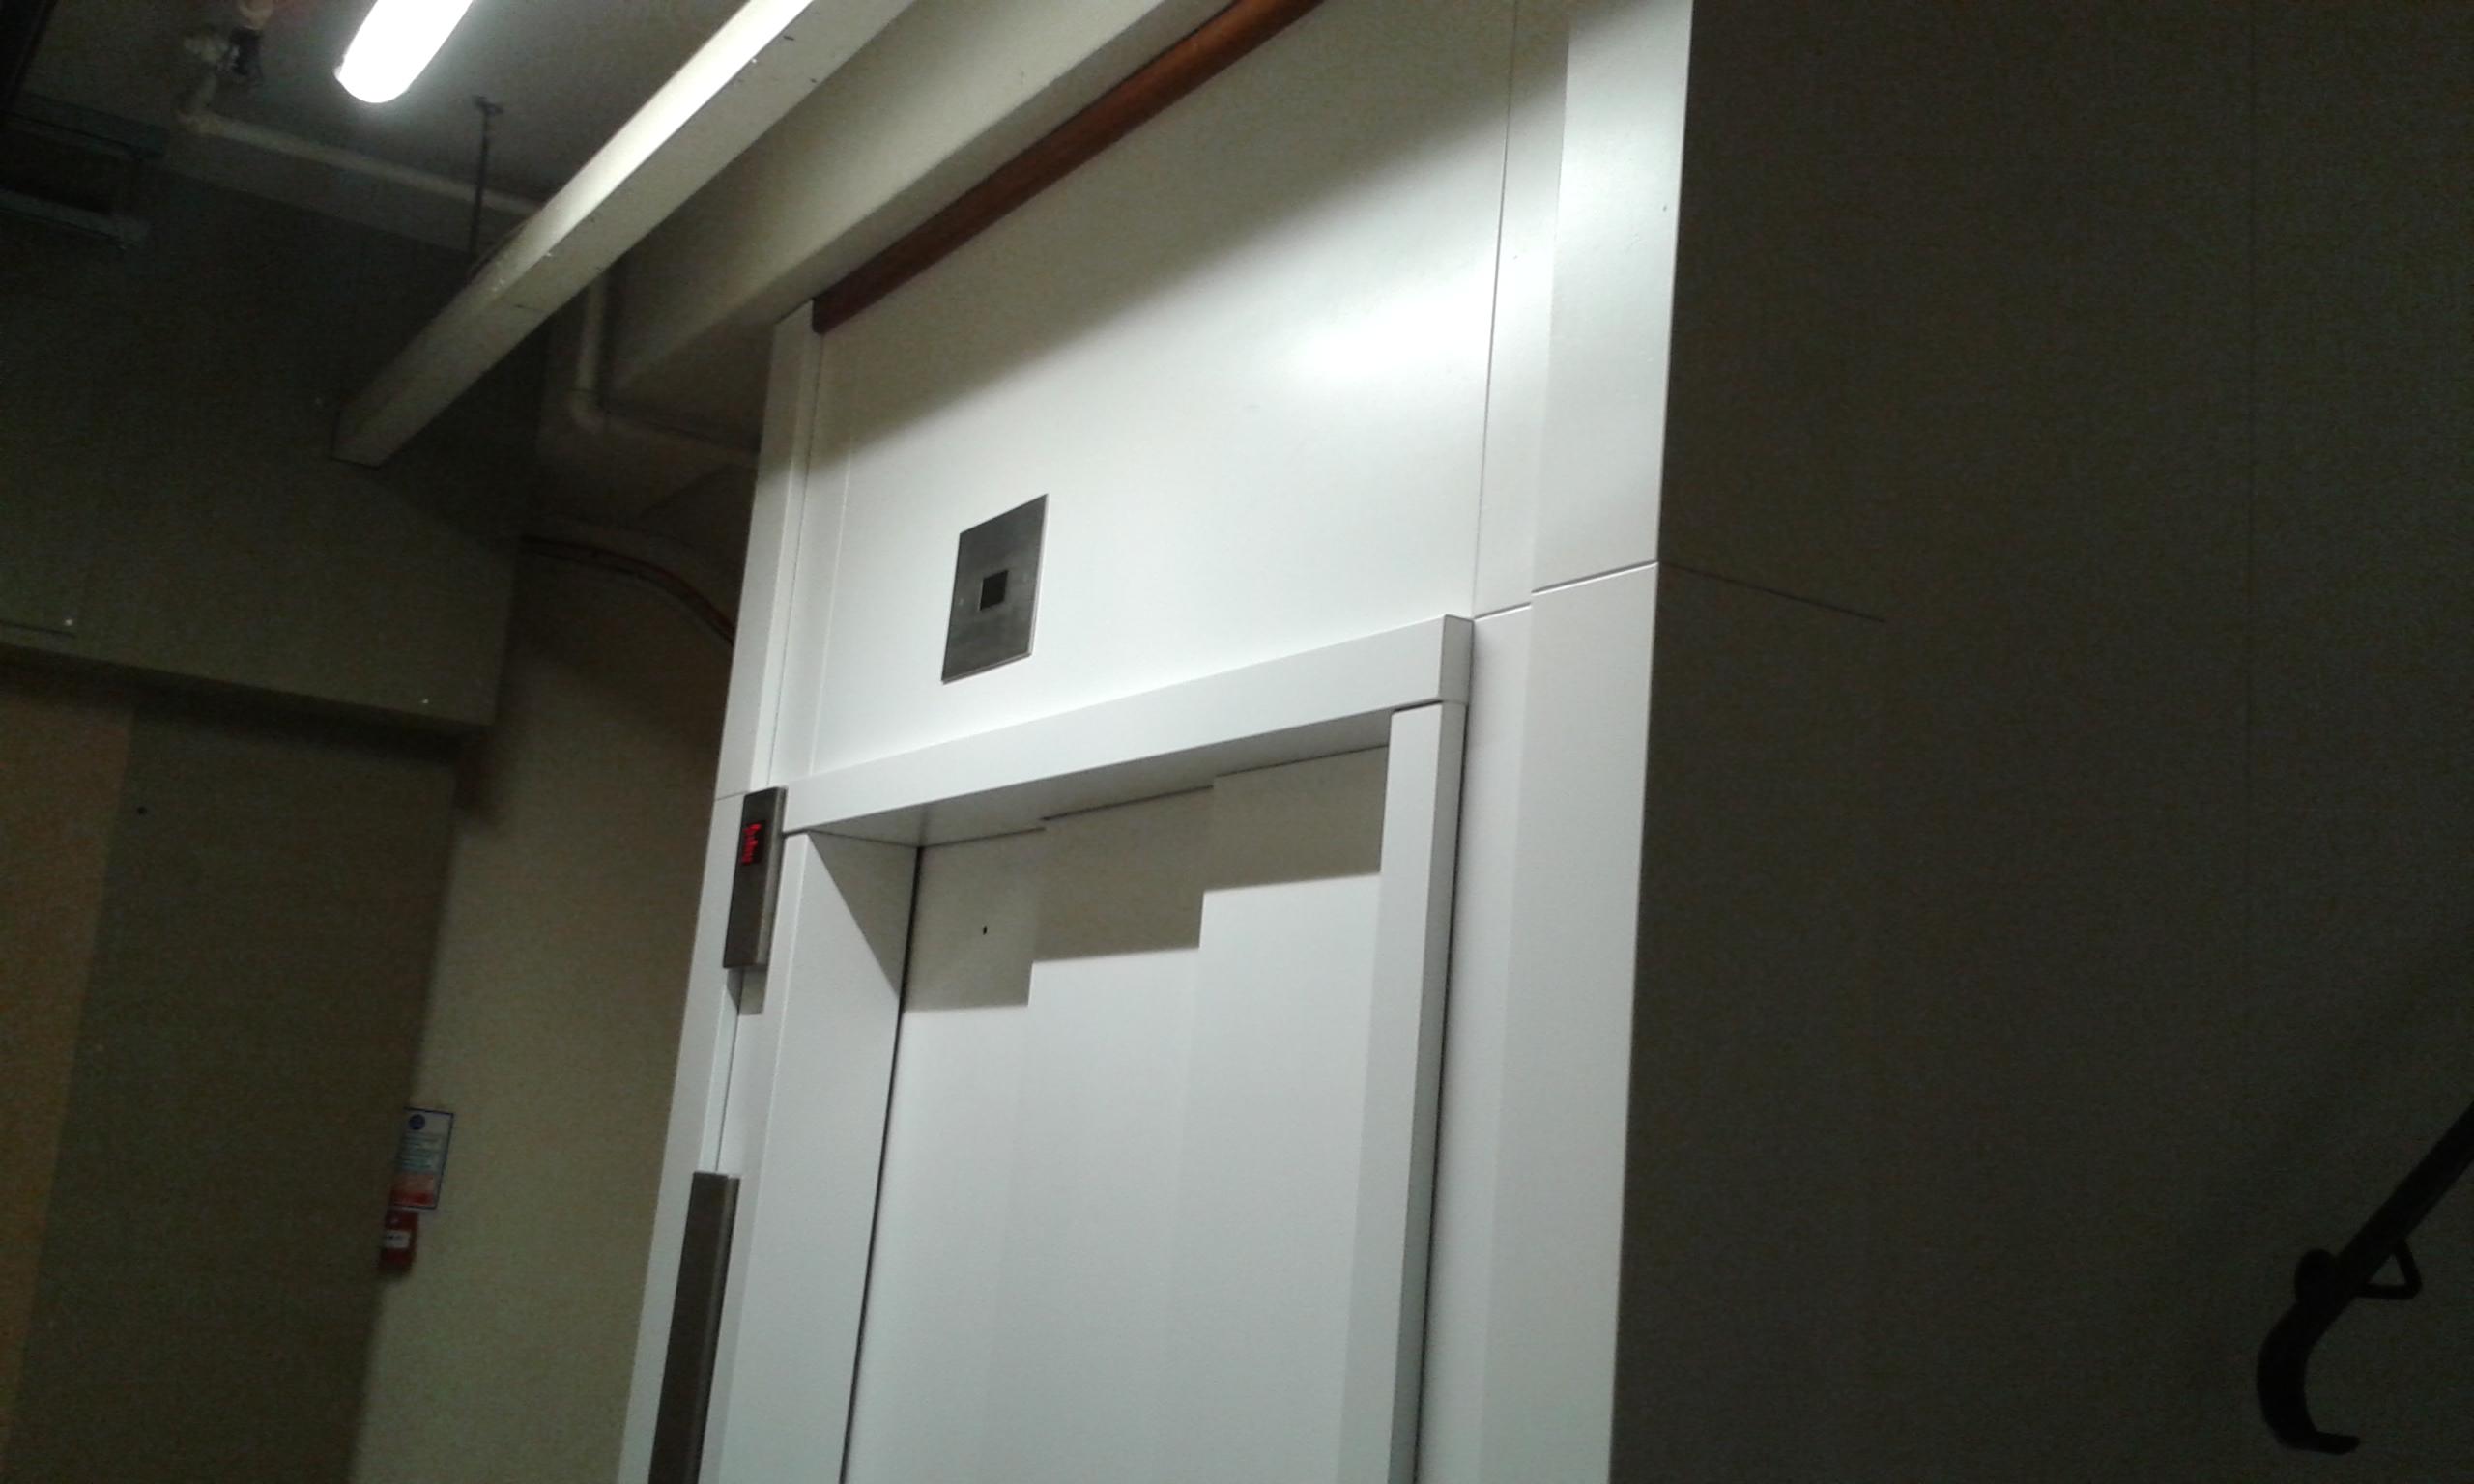 ceilcote paint spraying services cambridge void spraying uk. Black Bedroom Furniture Sets. Home Design Ideas